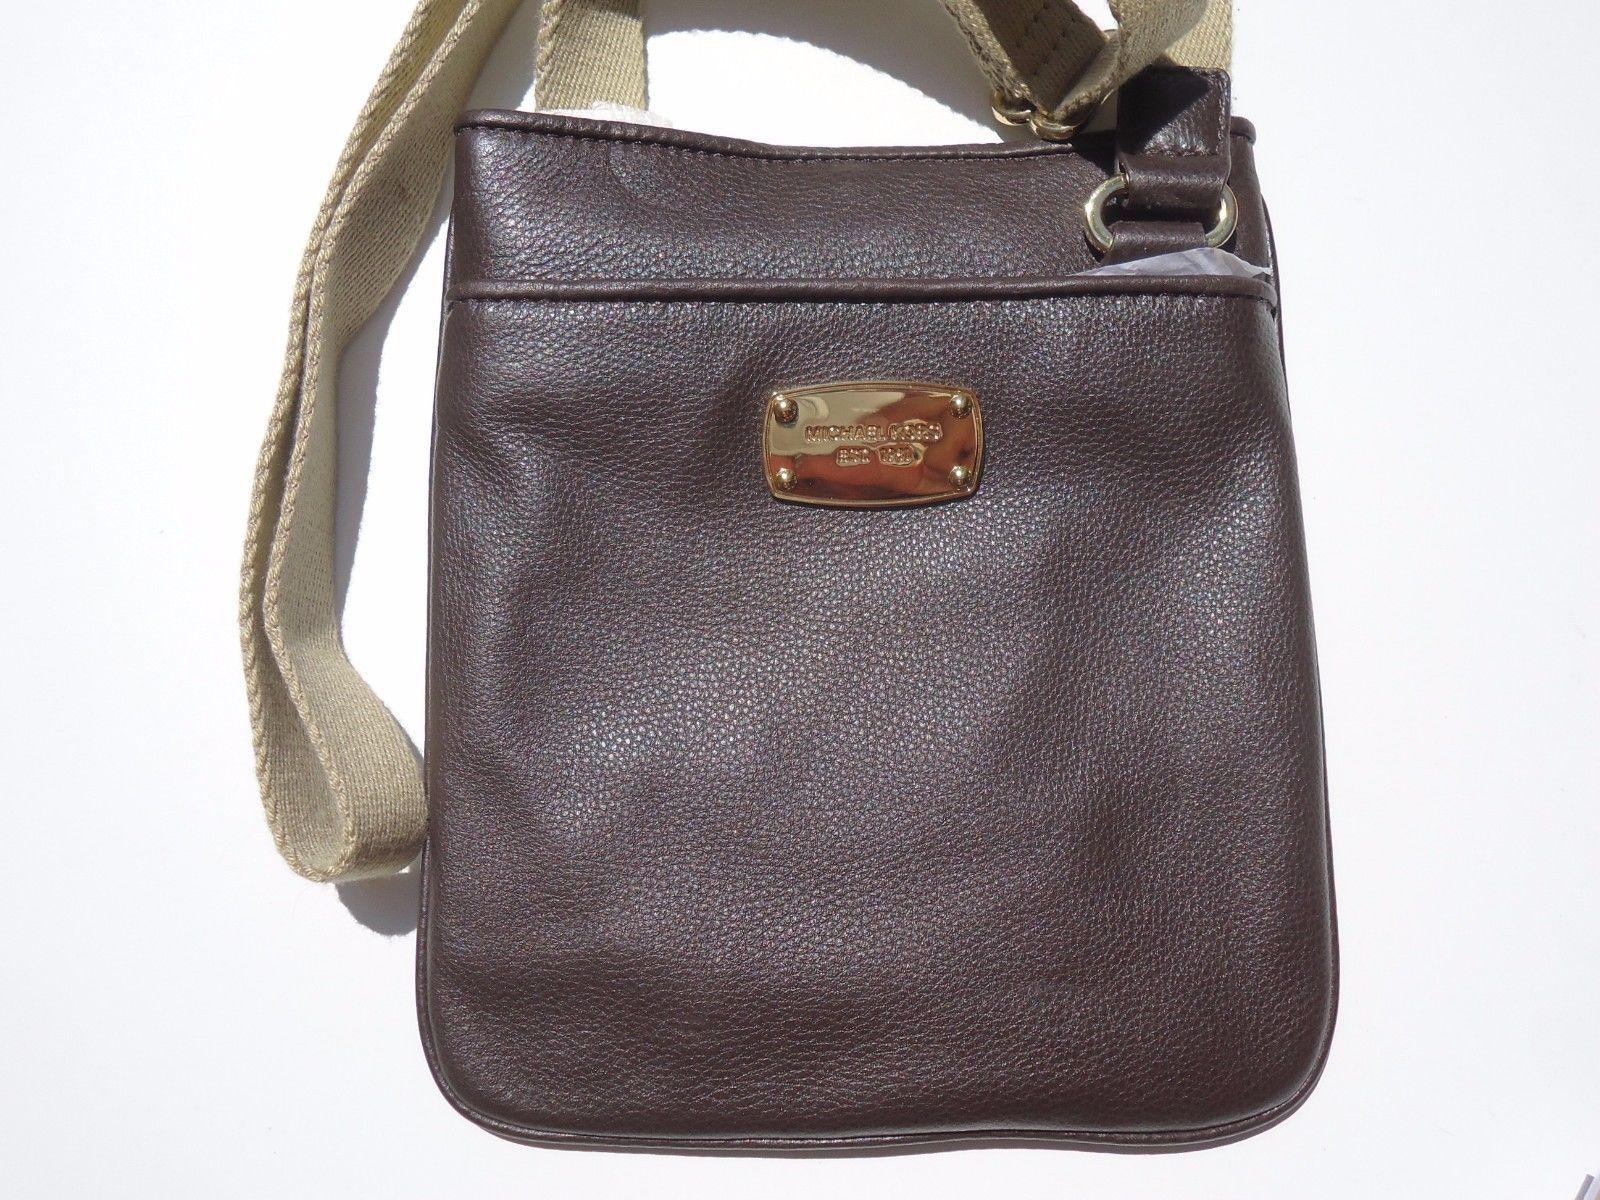 51252584df19 NEW! $158 Chocolate MICHAEL KORS Genuine and 50 similar items